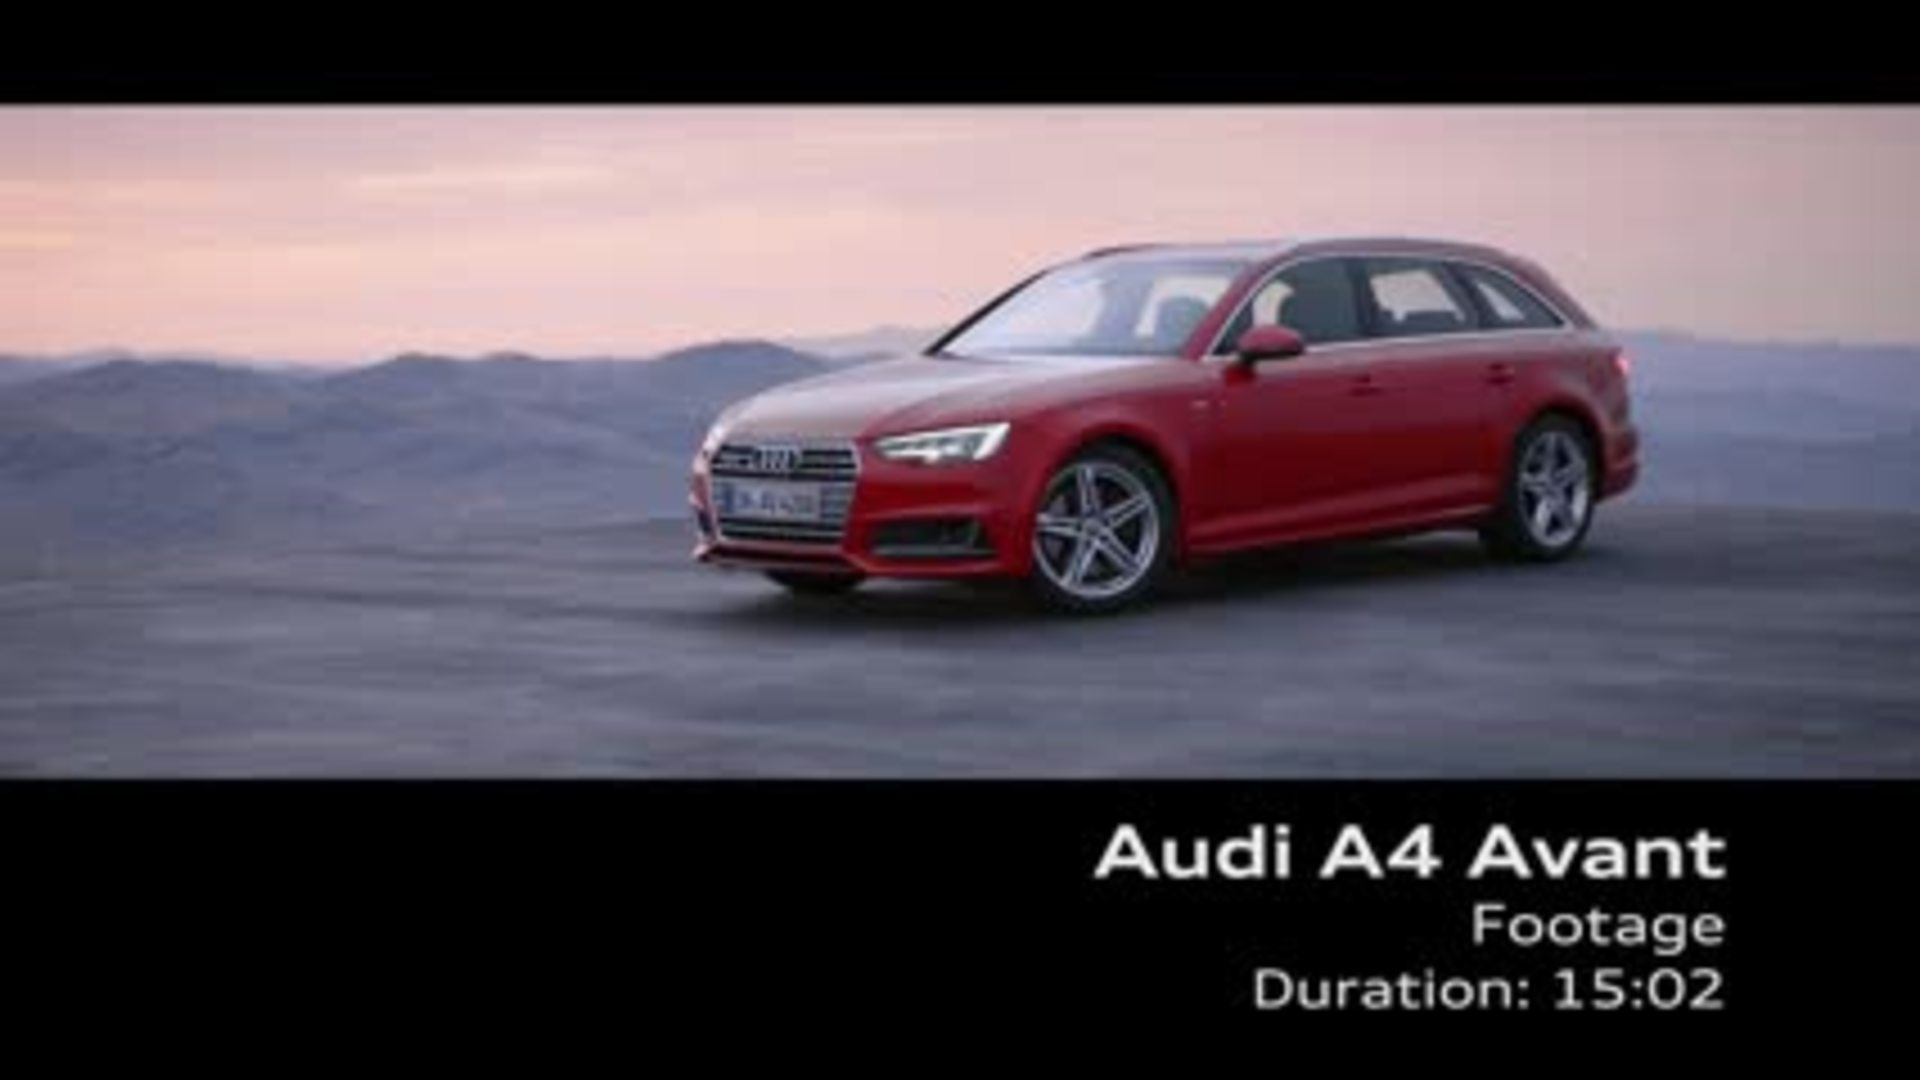 Der neue Audi A4 Avant - Footage